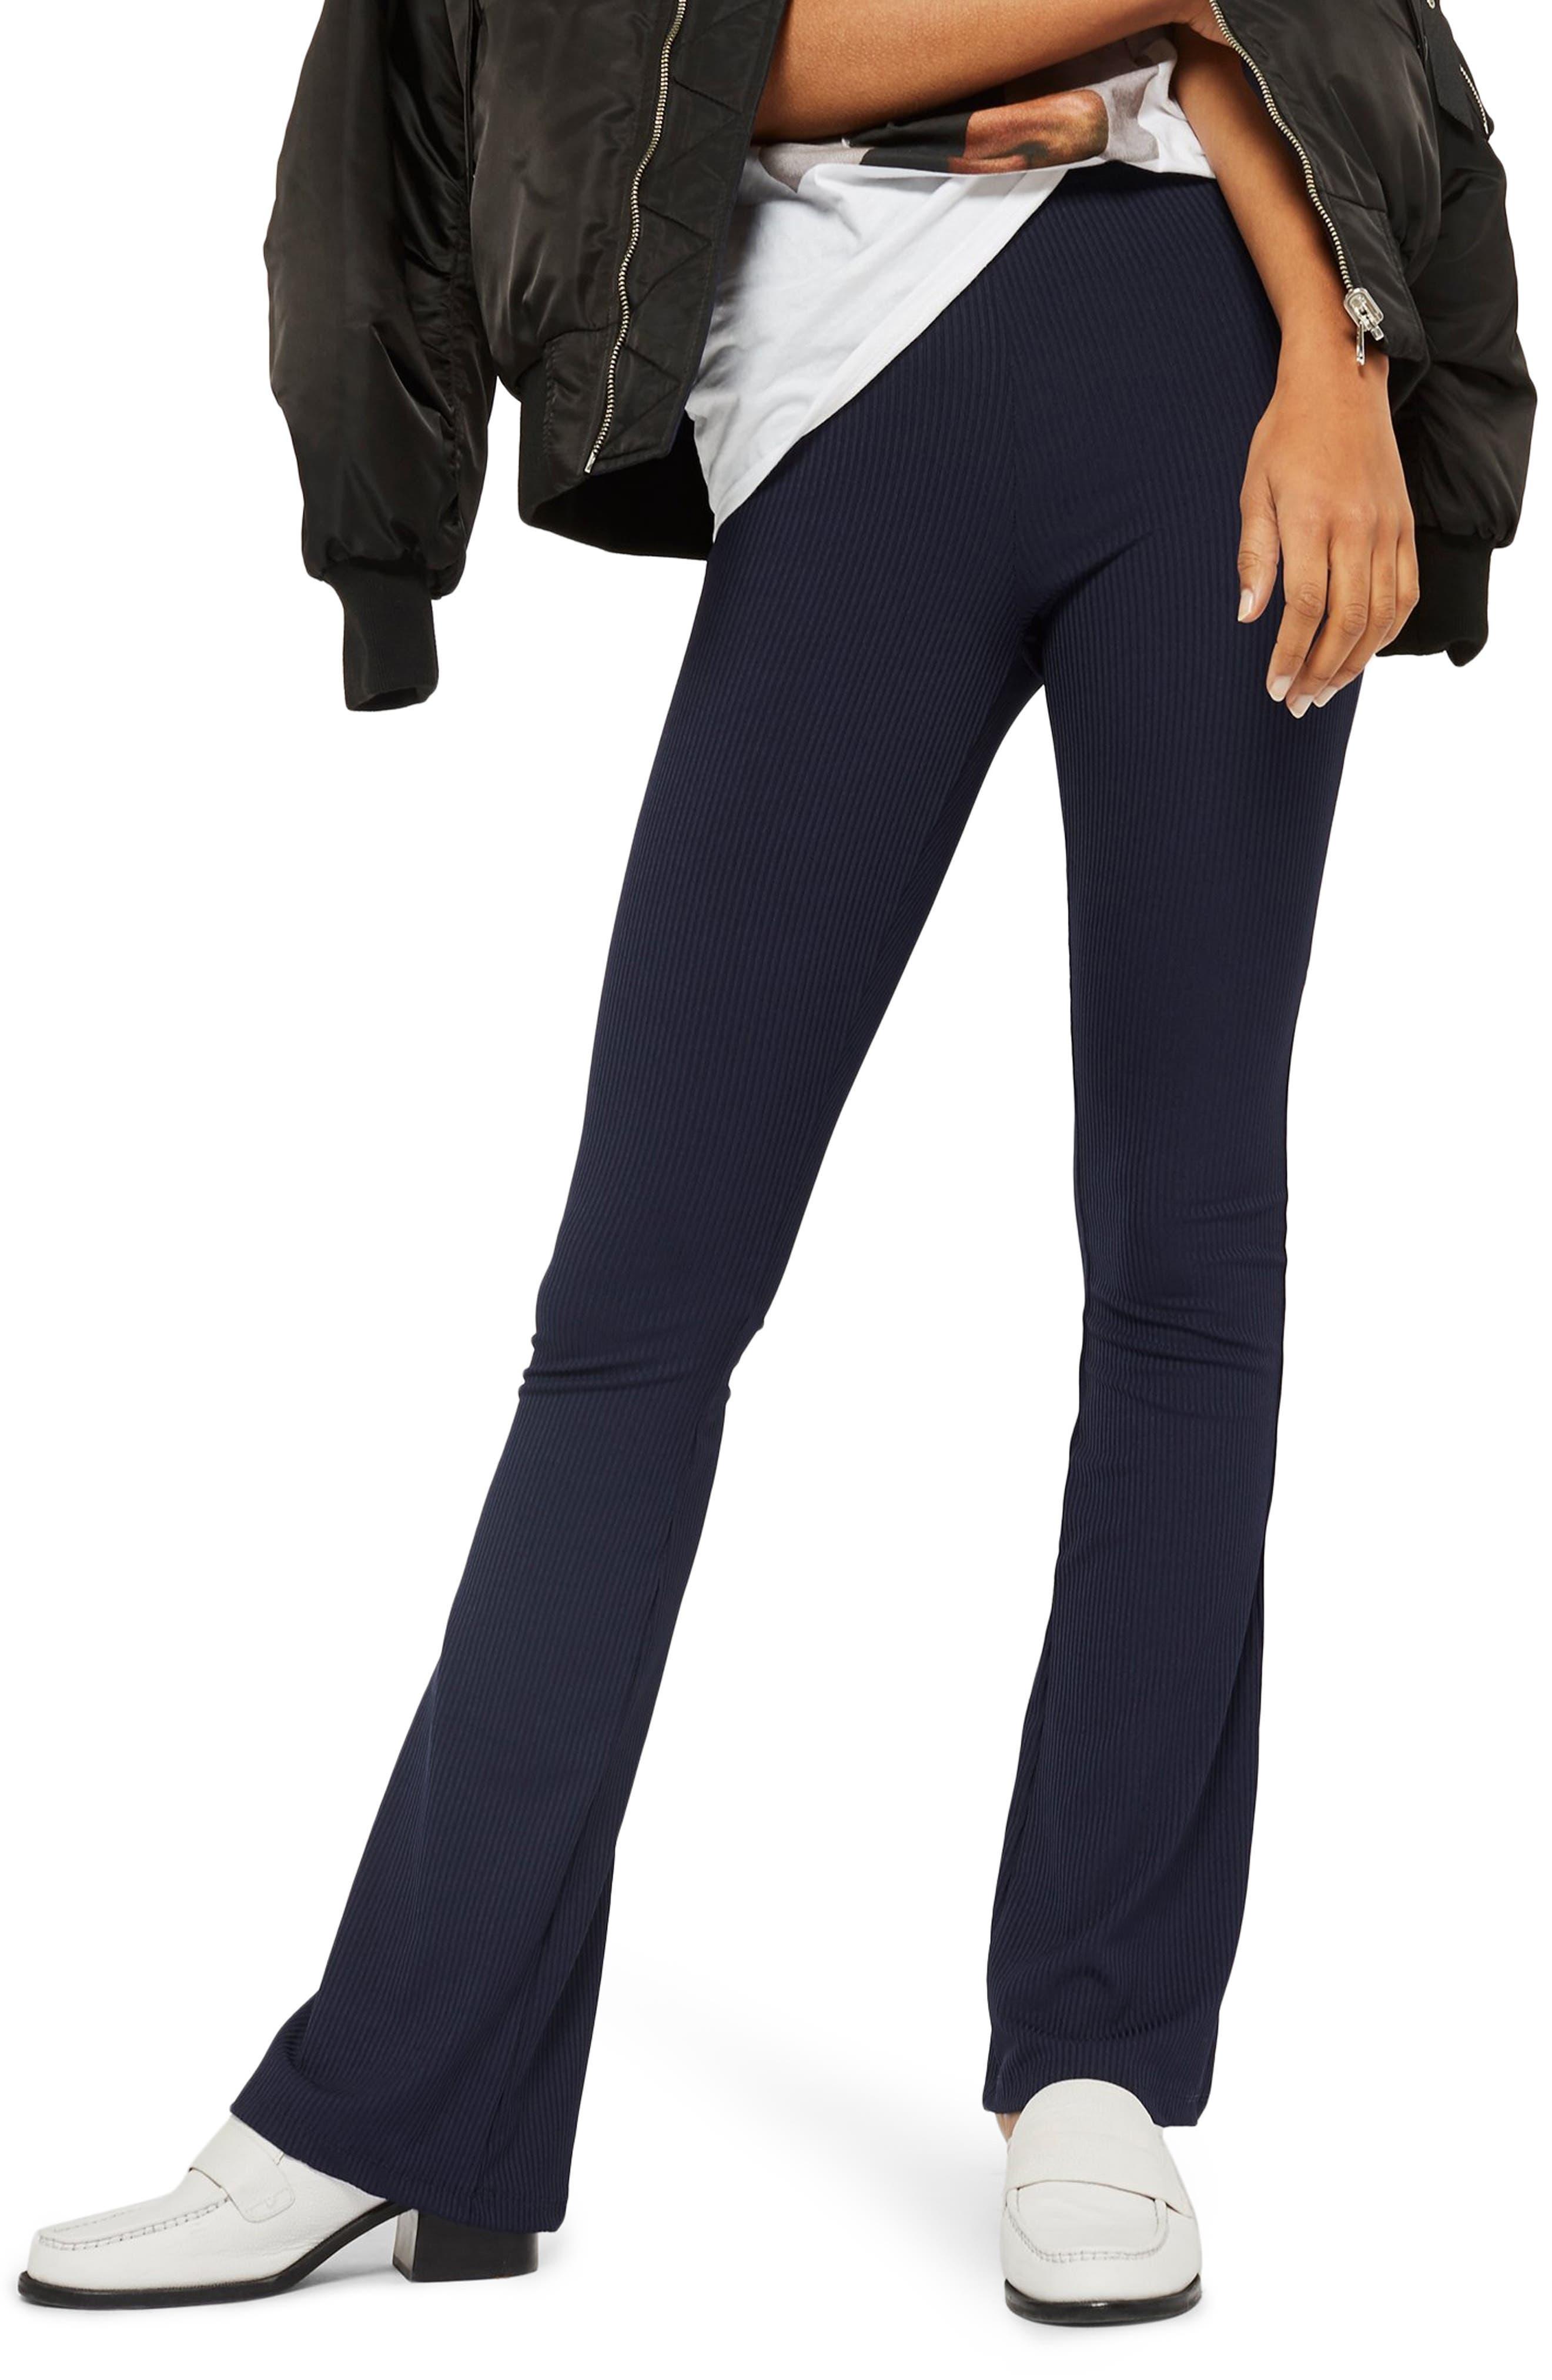 Topshop Skinny Ribbed Flare Pants, US (fits like 0-2) - Blue